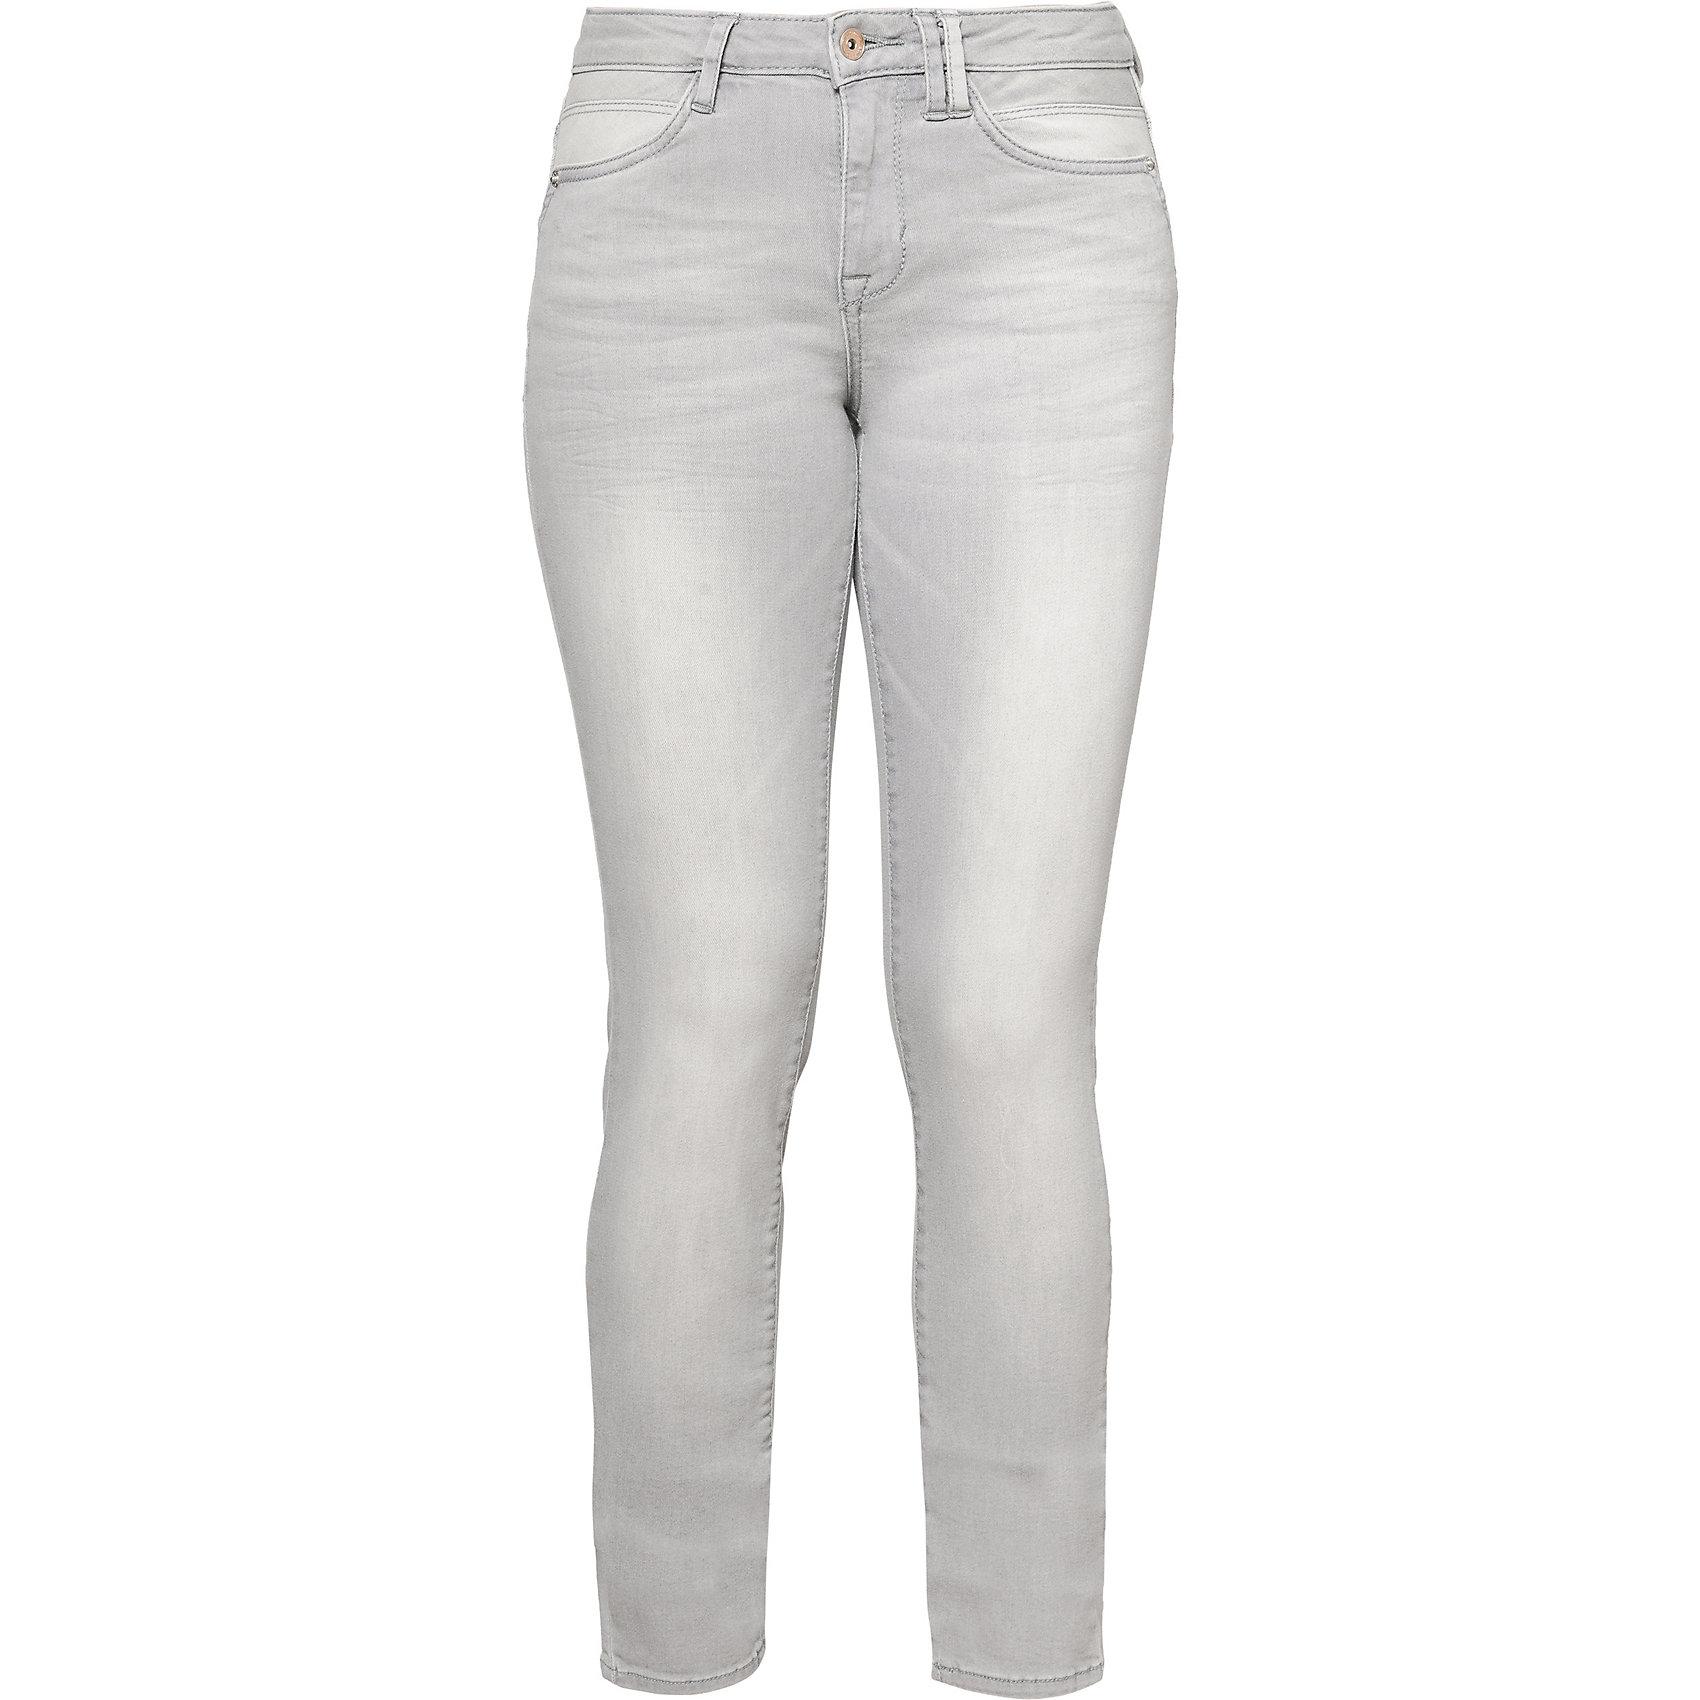 bbc0437f9f55 Neu TOM TAILOR Jeans Alexa Slim 7683213 für Damen hellgrau   eBay